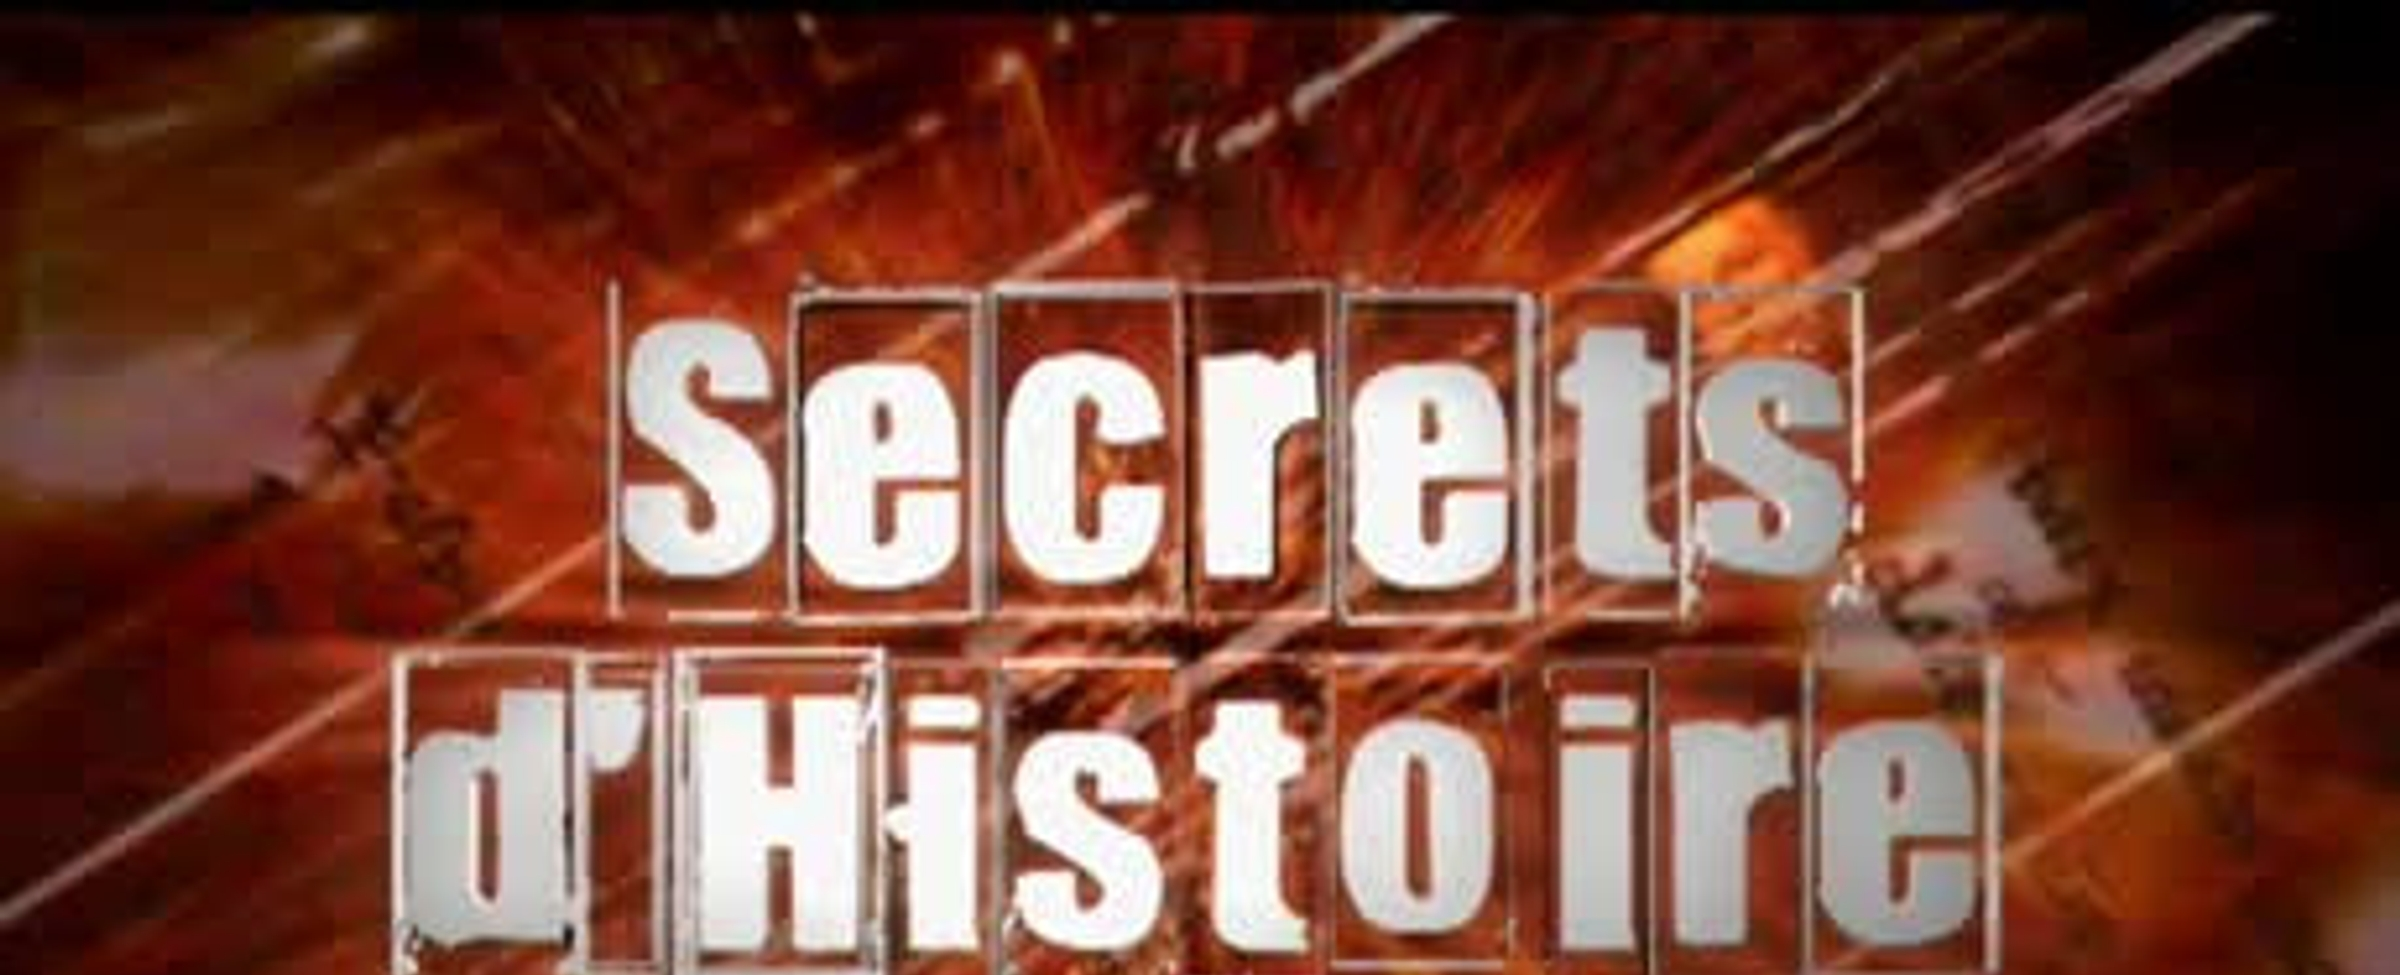 Záhadná historie